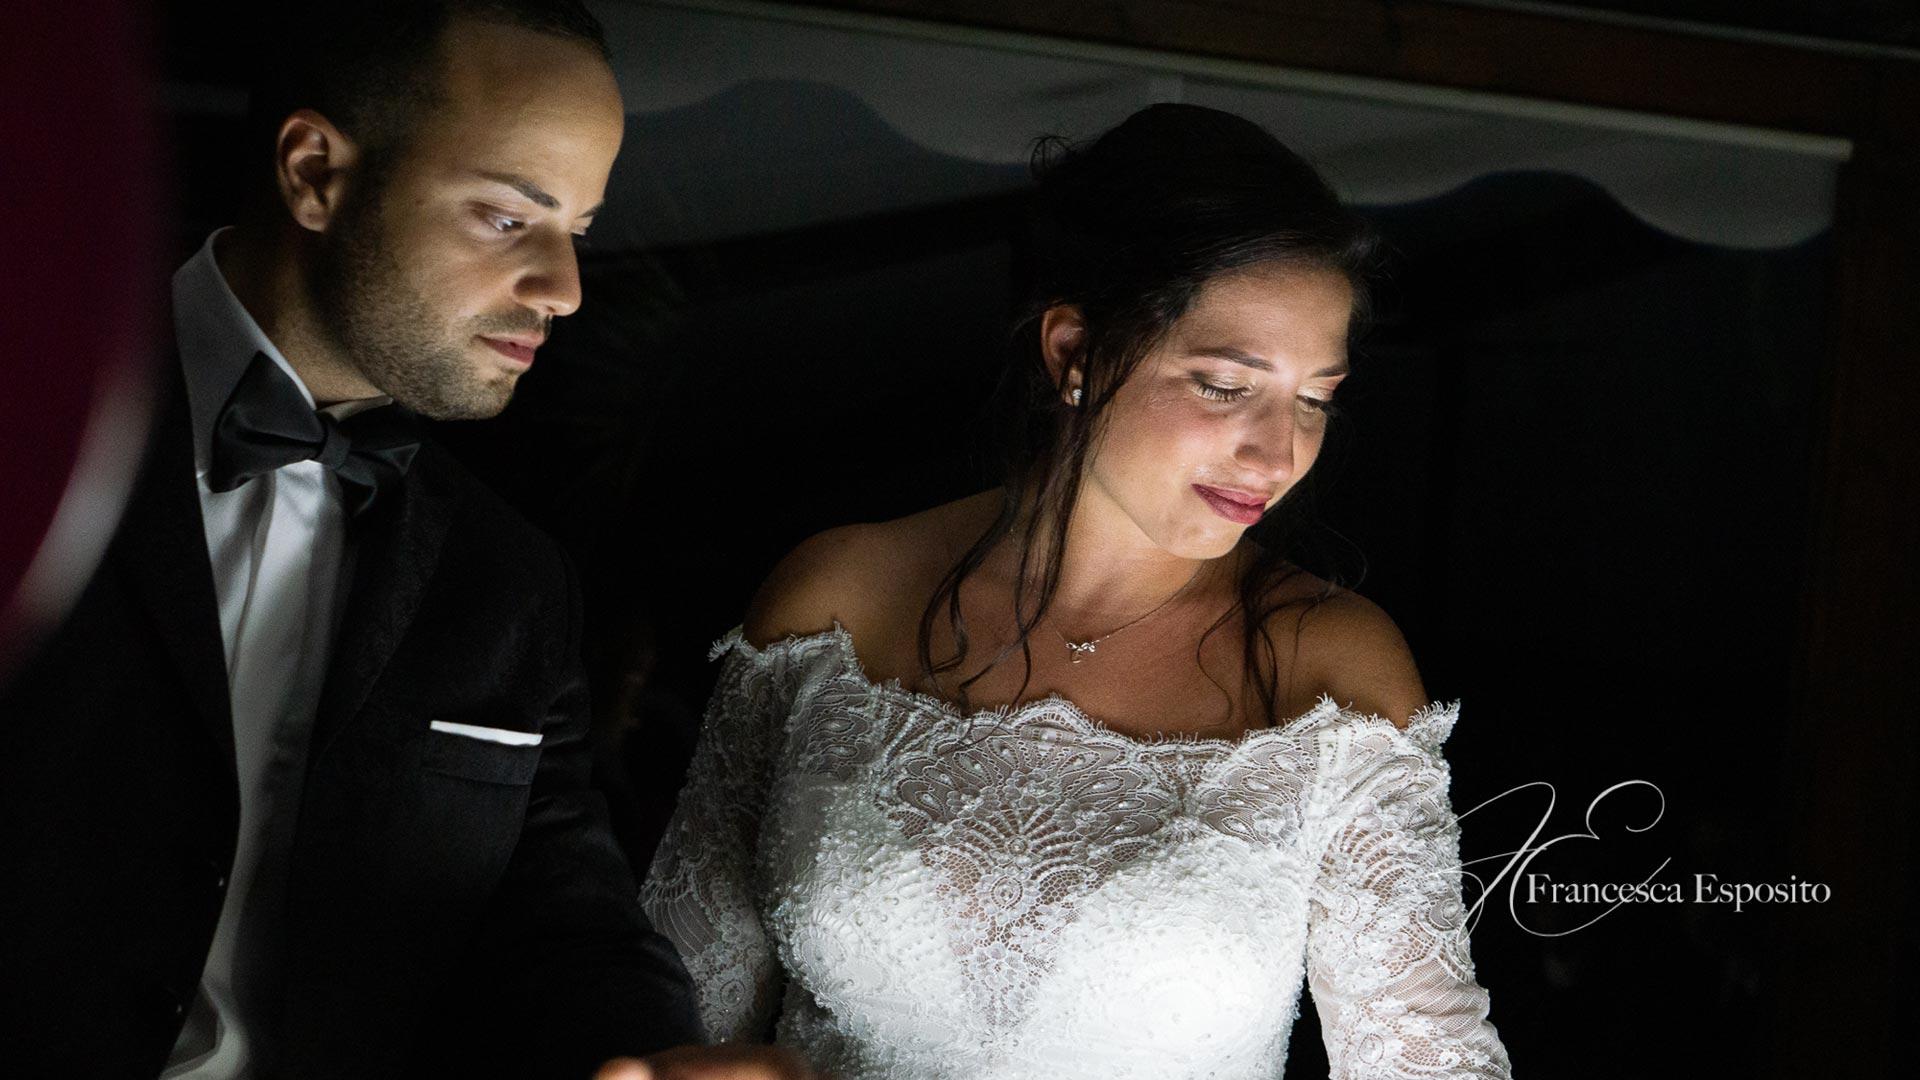 matrimonio a sorrento idee matrimonio eco chic matrimonio a sorrento a tema semplicità organizzazione matrimoni speciali francesca esposito